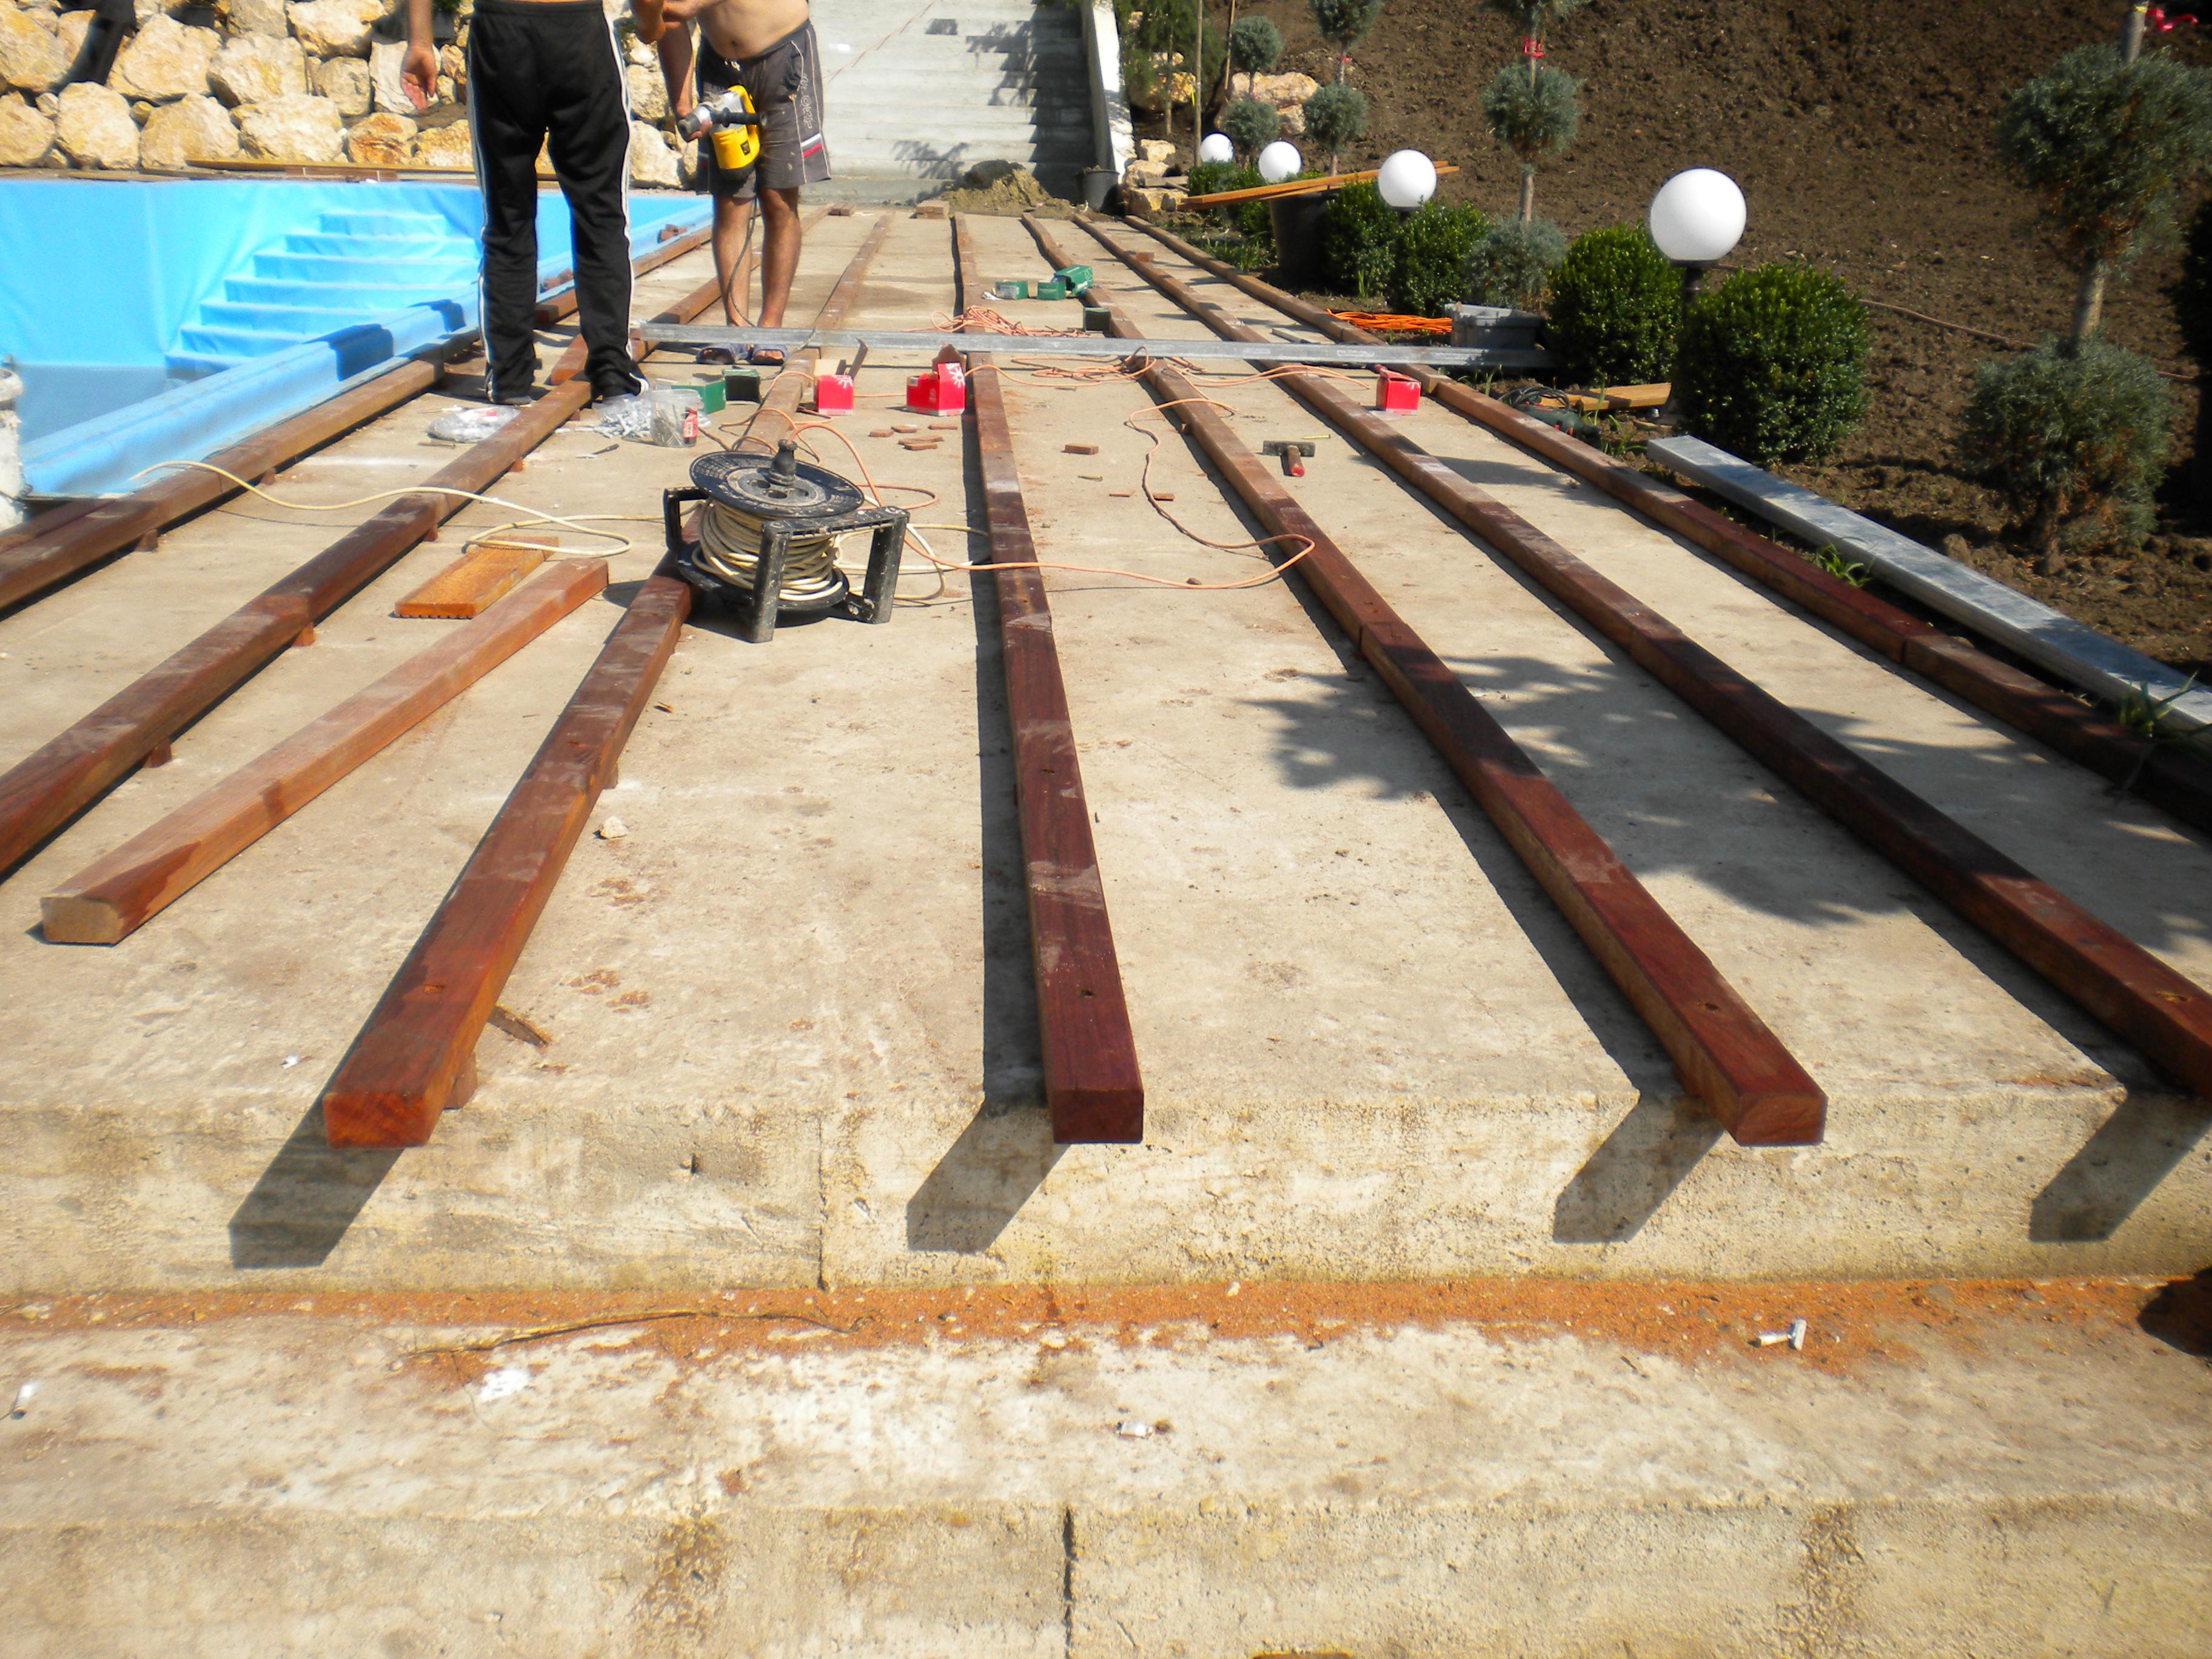 Deck-uri lemn - Angelim Pedra SELVA FLOORS - Poza 12